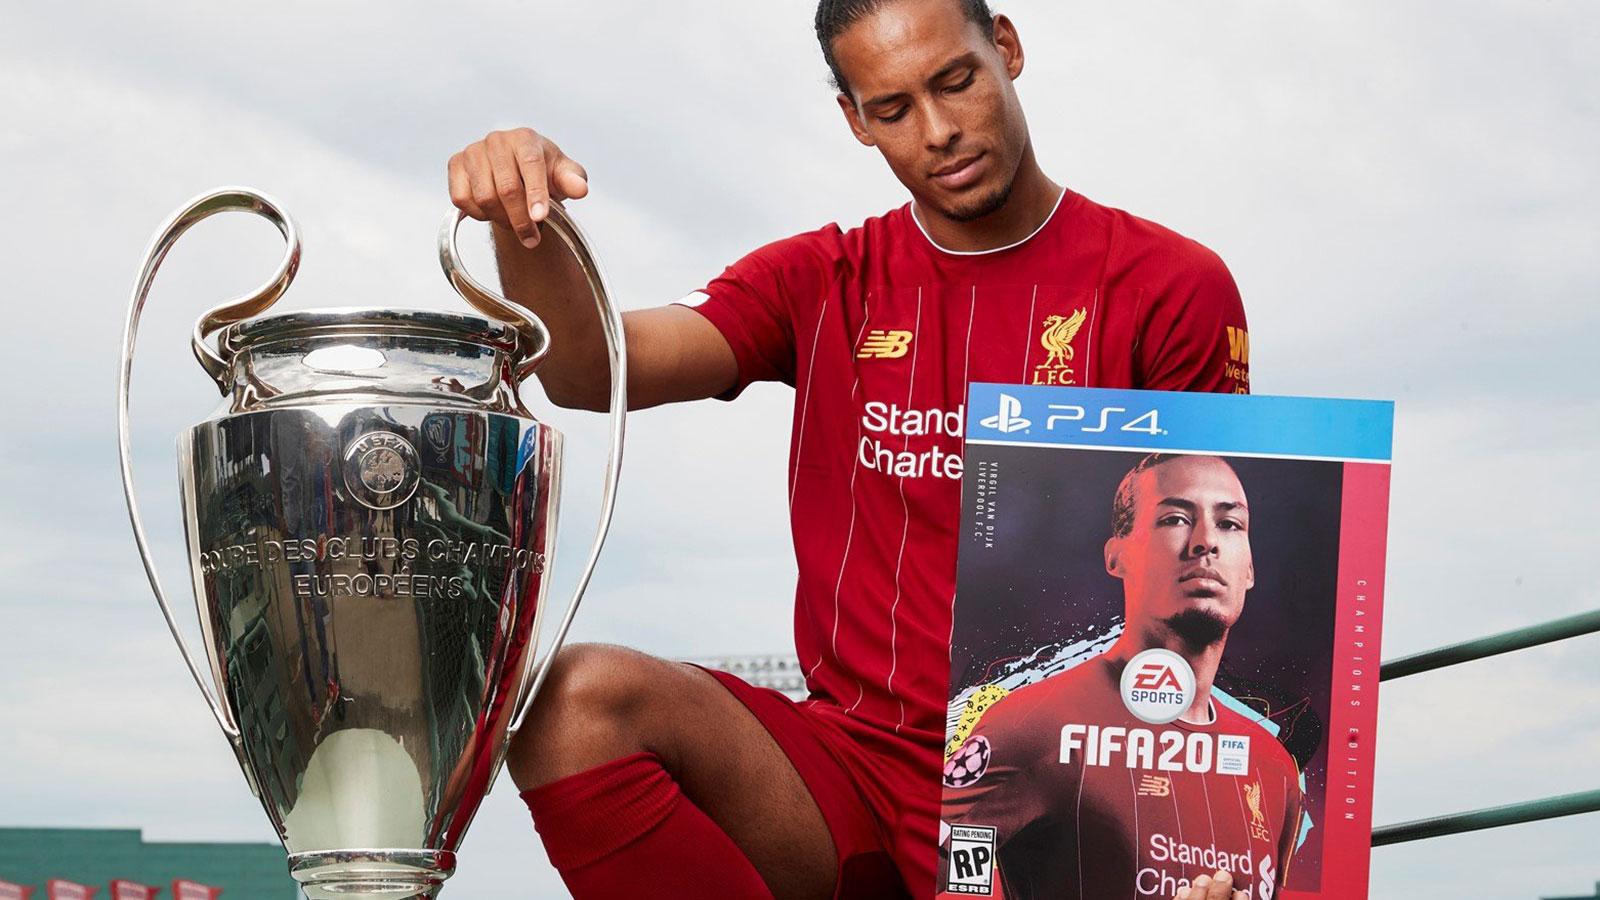 Virgil Van Dijk tenant une affiche FIFA 20